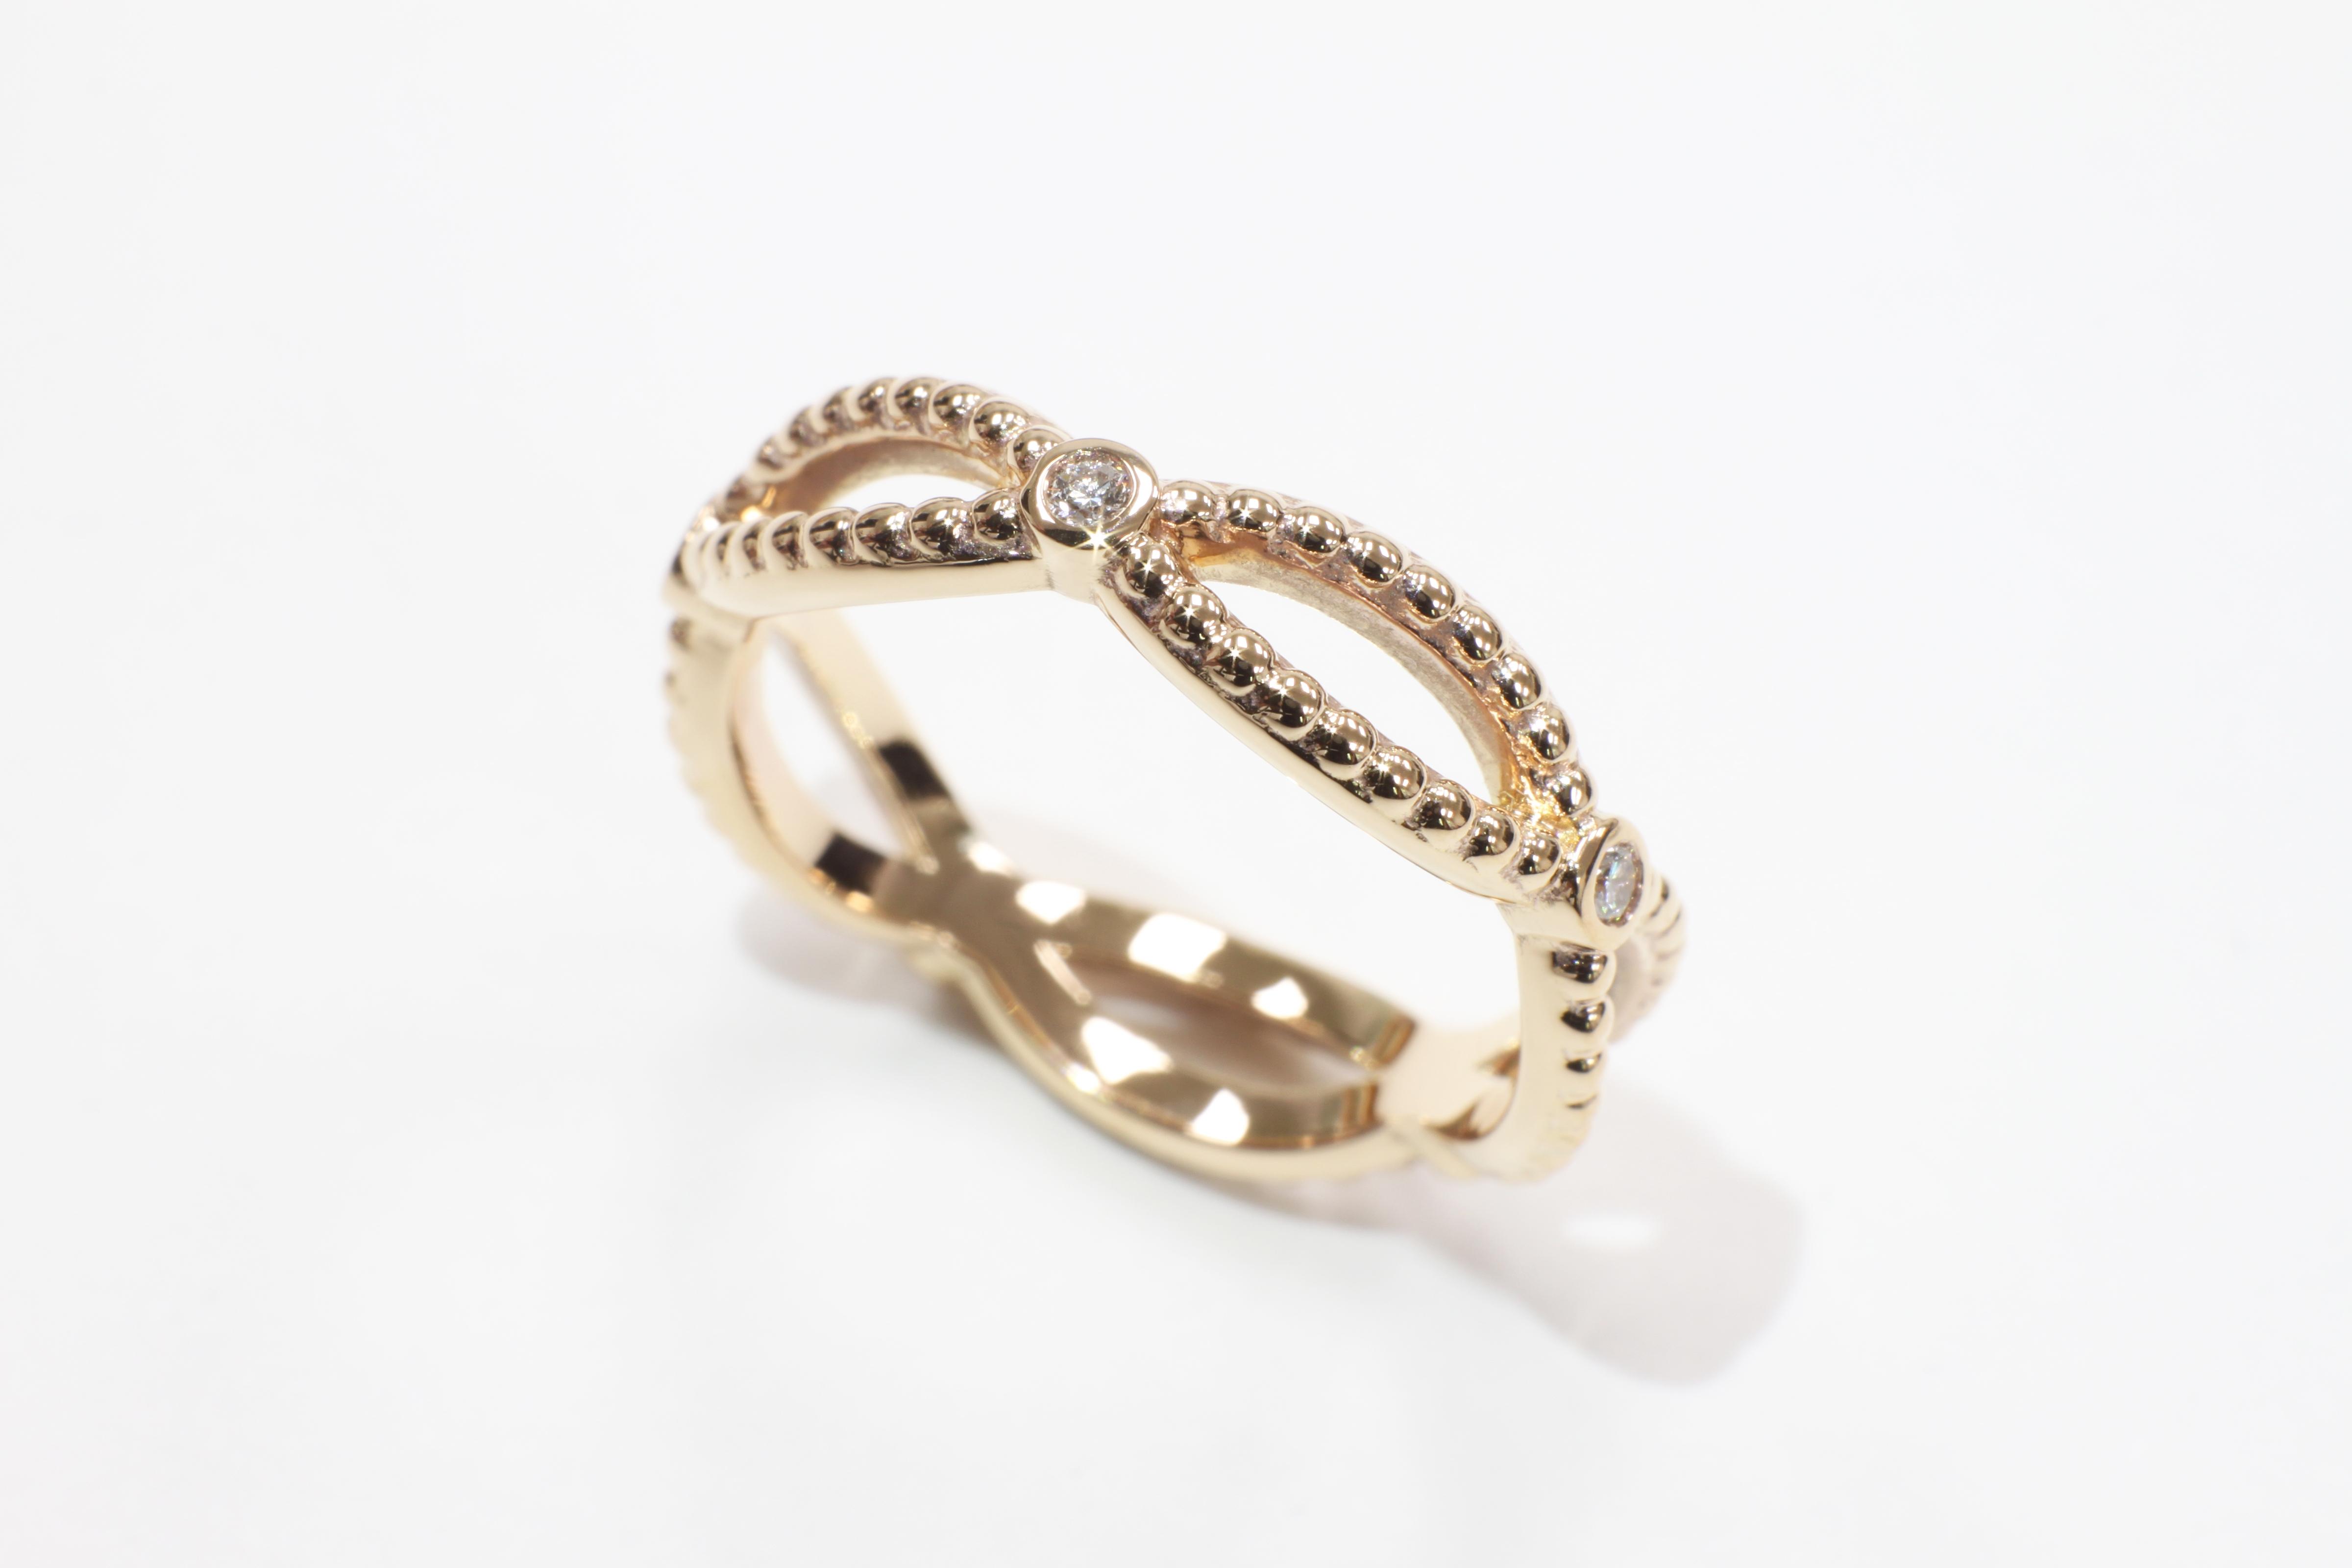 Wedding Ring 1 – Copyright BJRdesigns